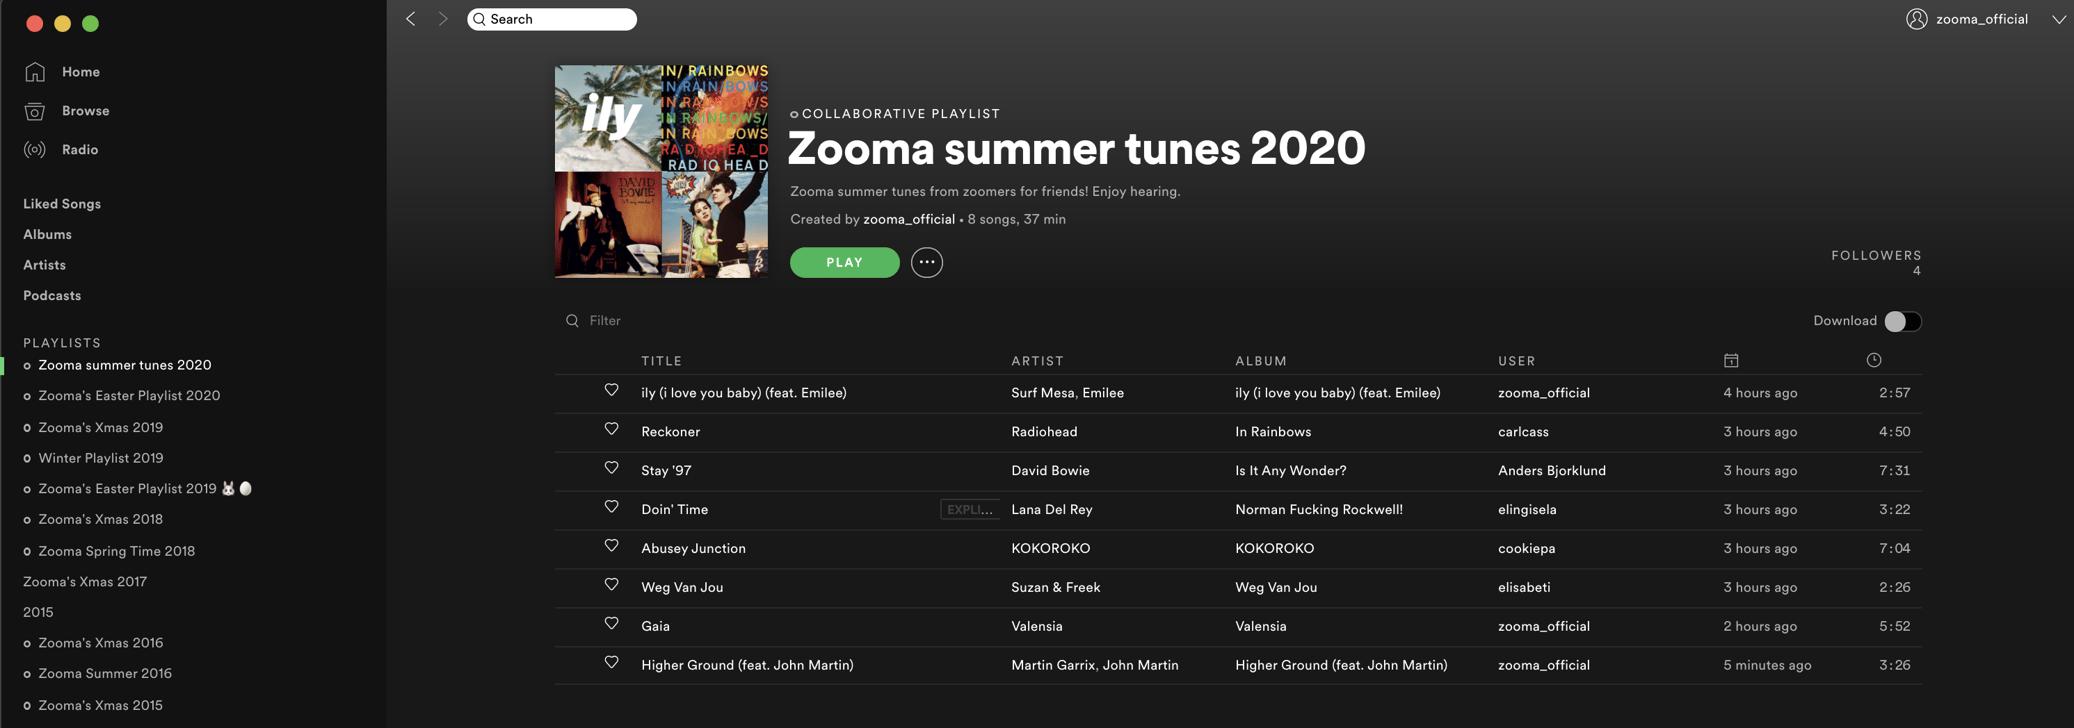 Zooma summer tunes 2020